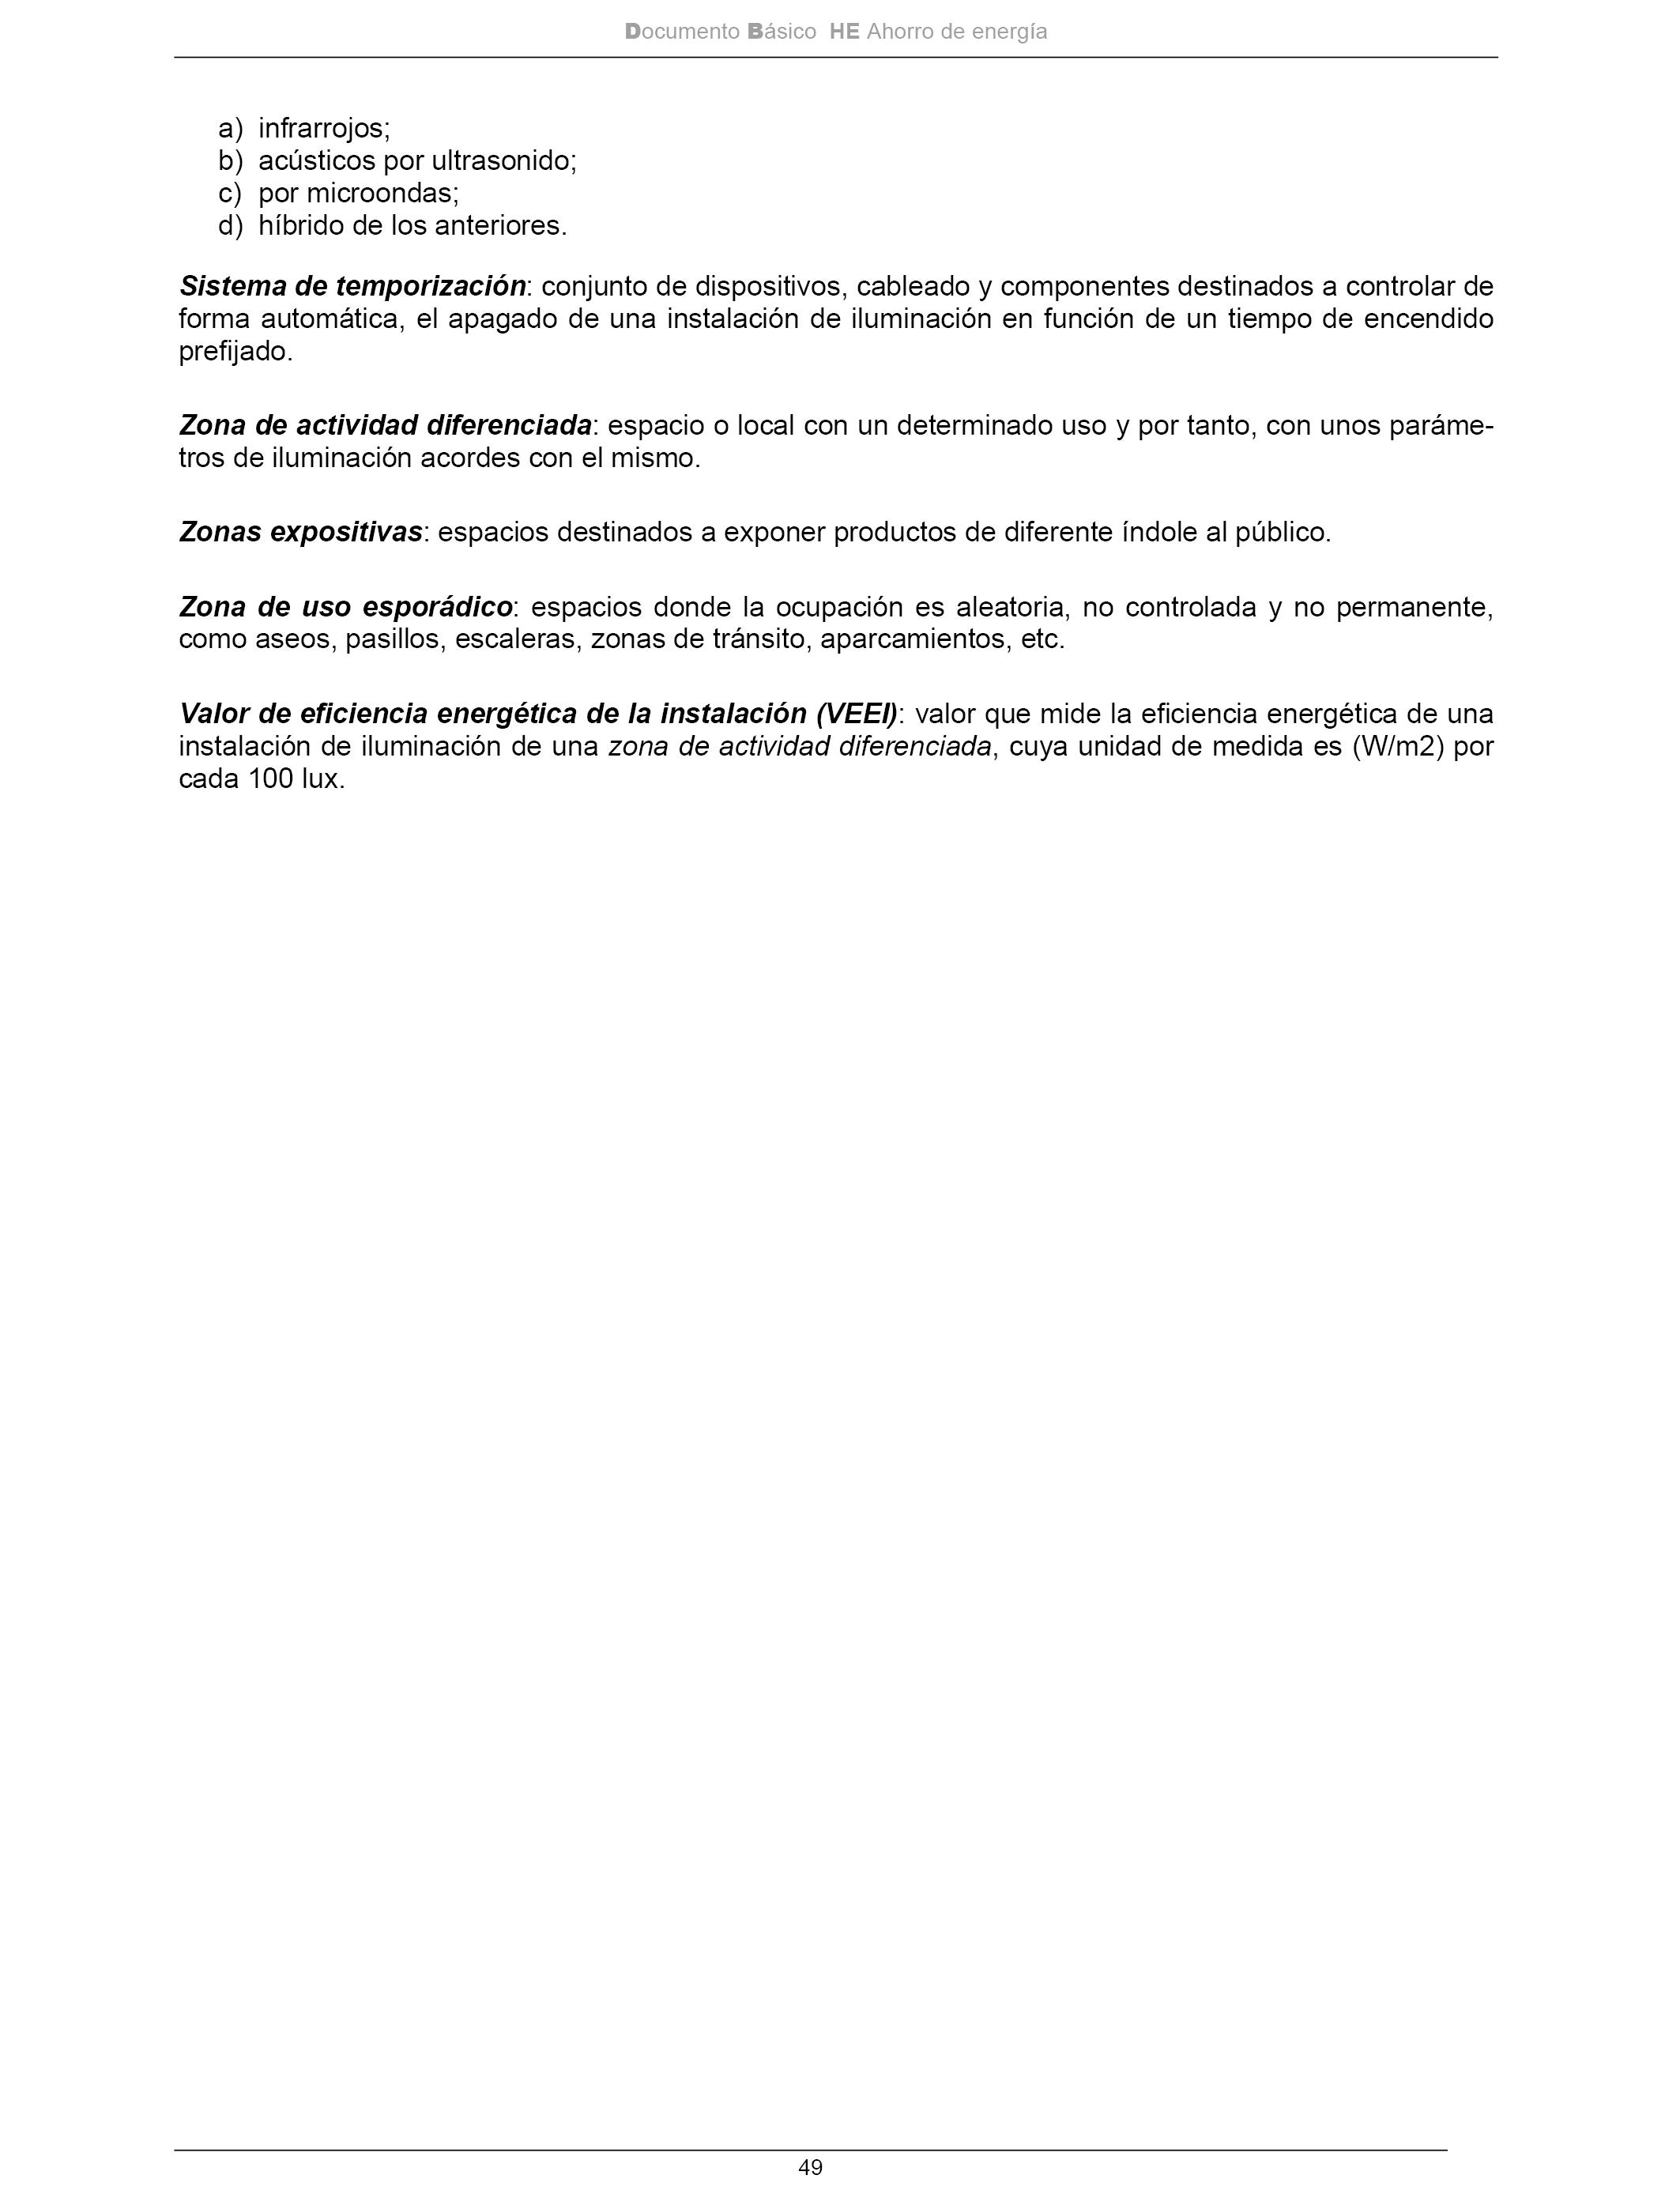 BOE.es - Documento BOE-A-2013-9511